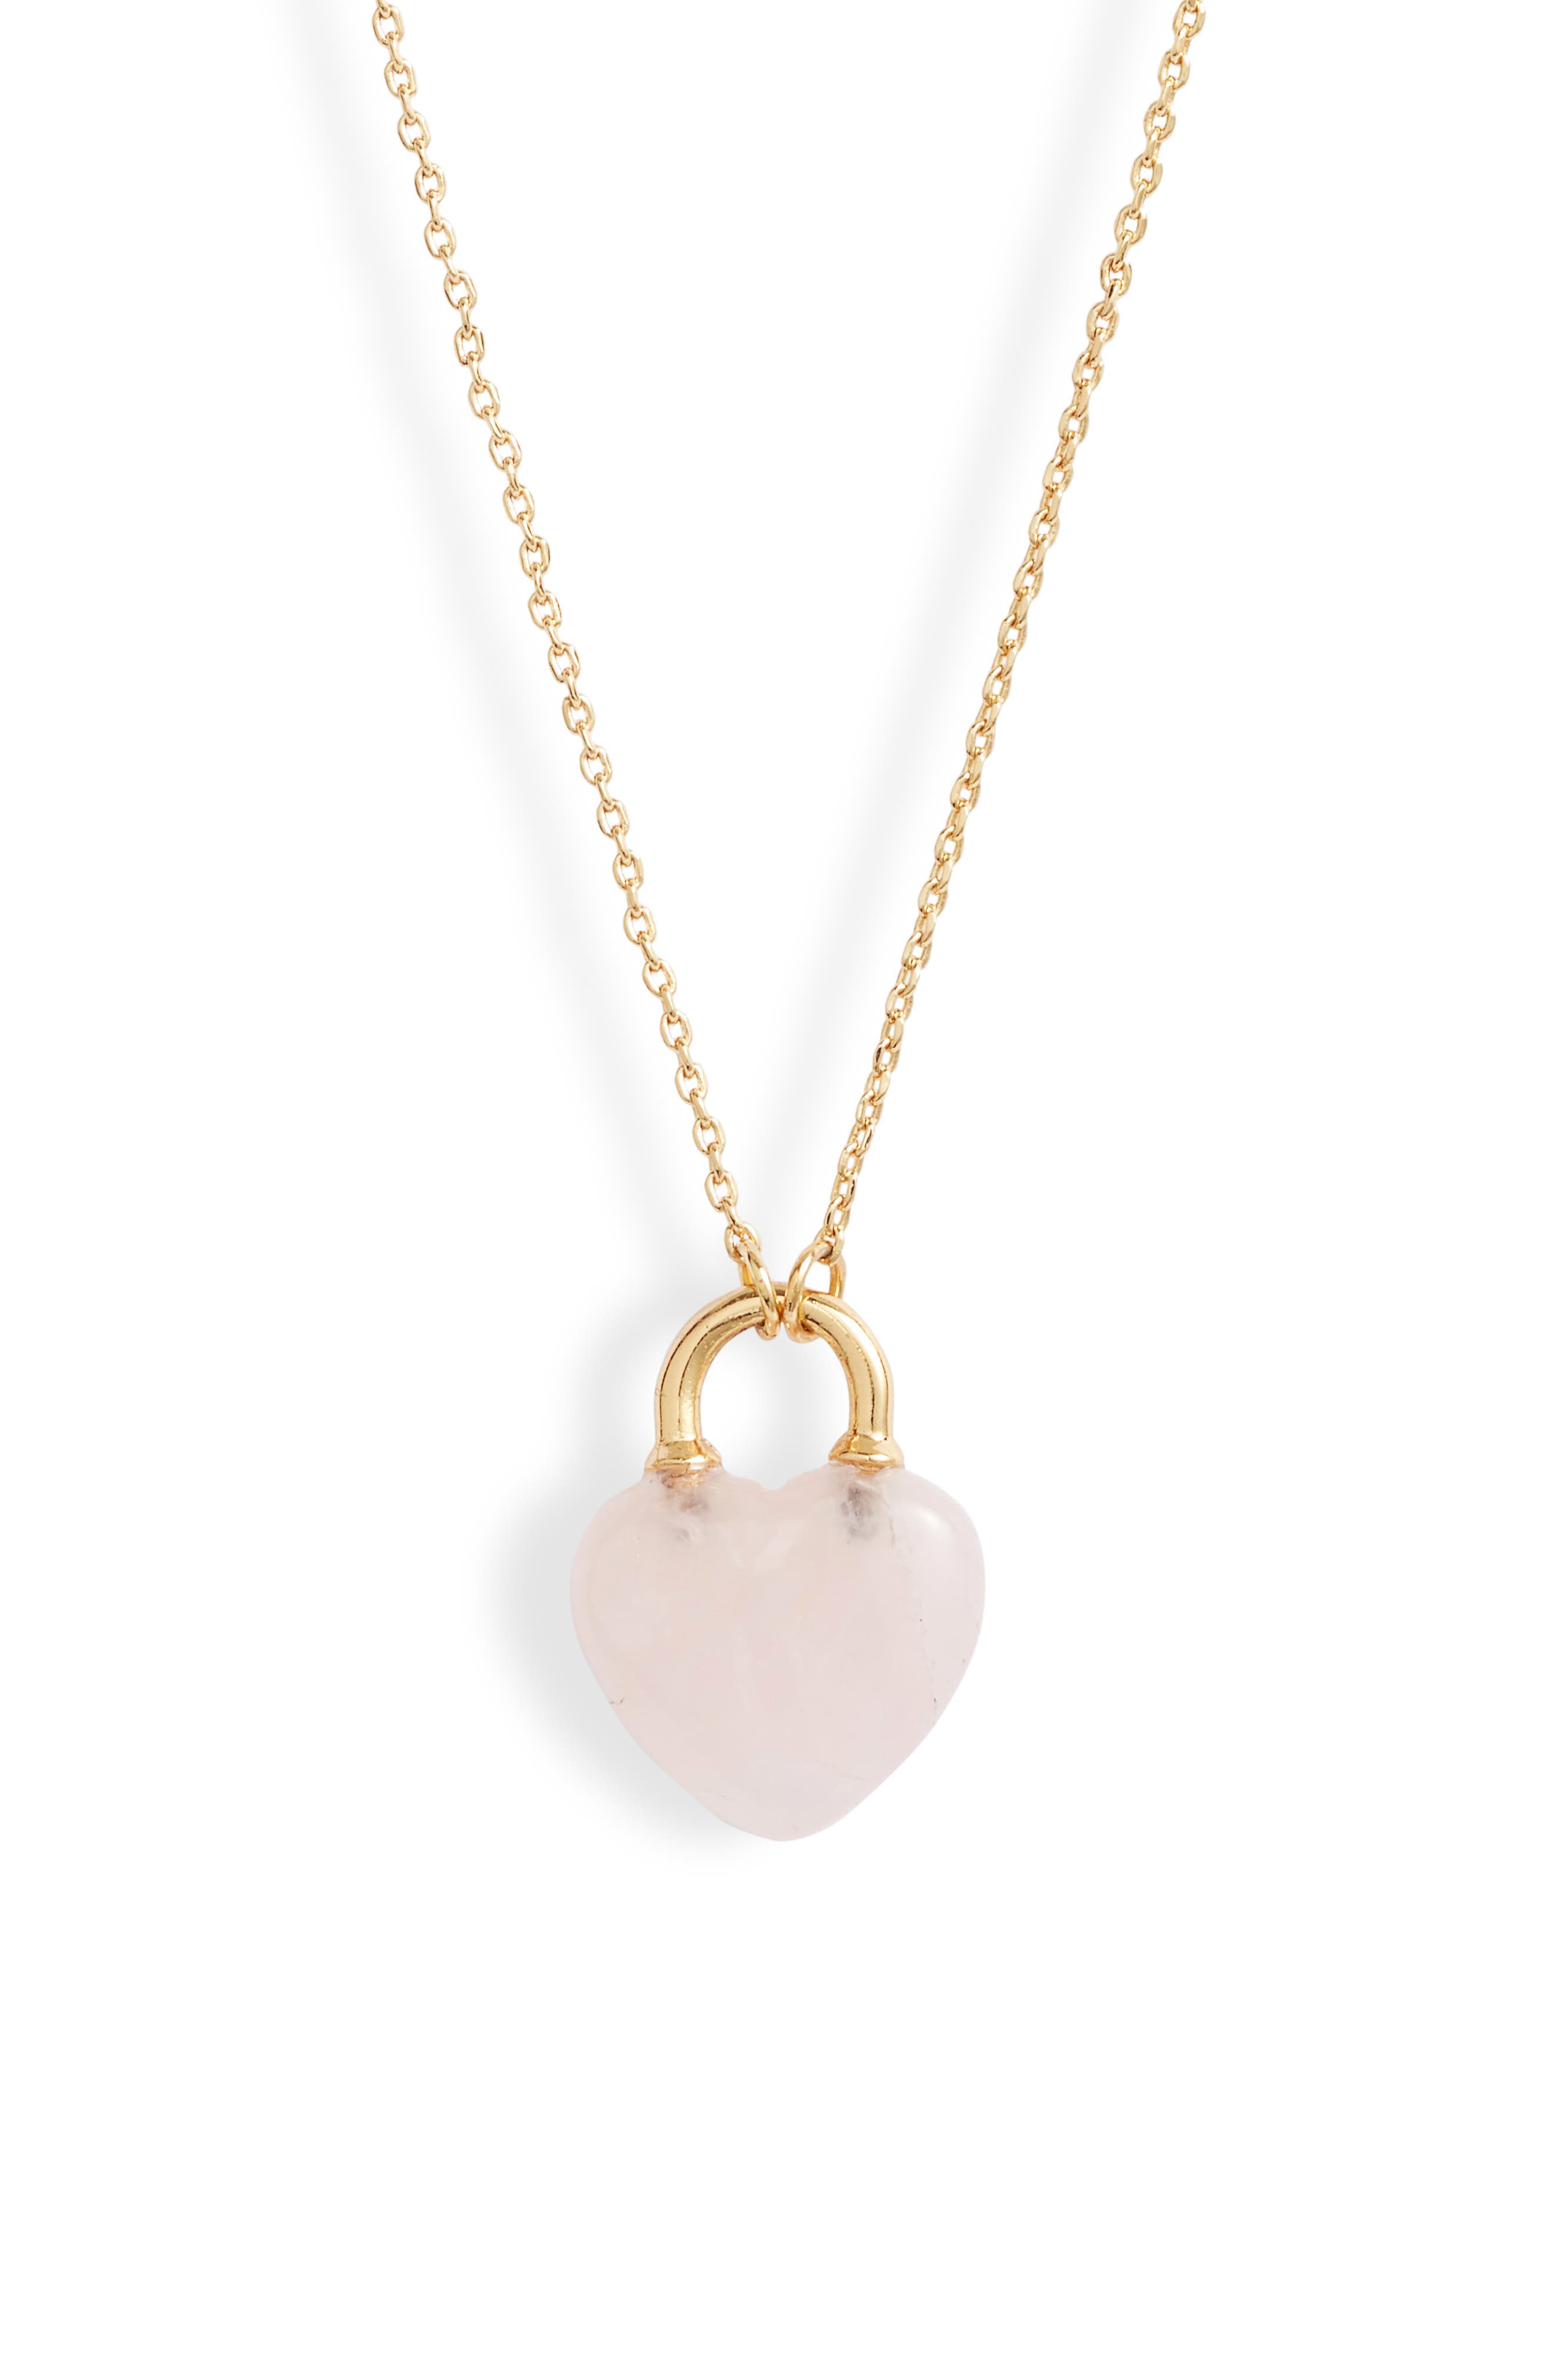 Kate Spade New York Jewelry open heart stone lock mini pendant necklace